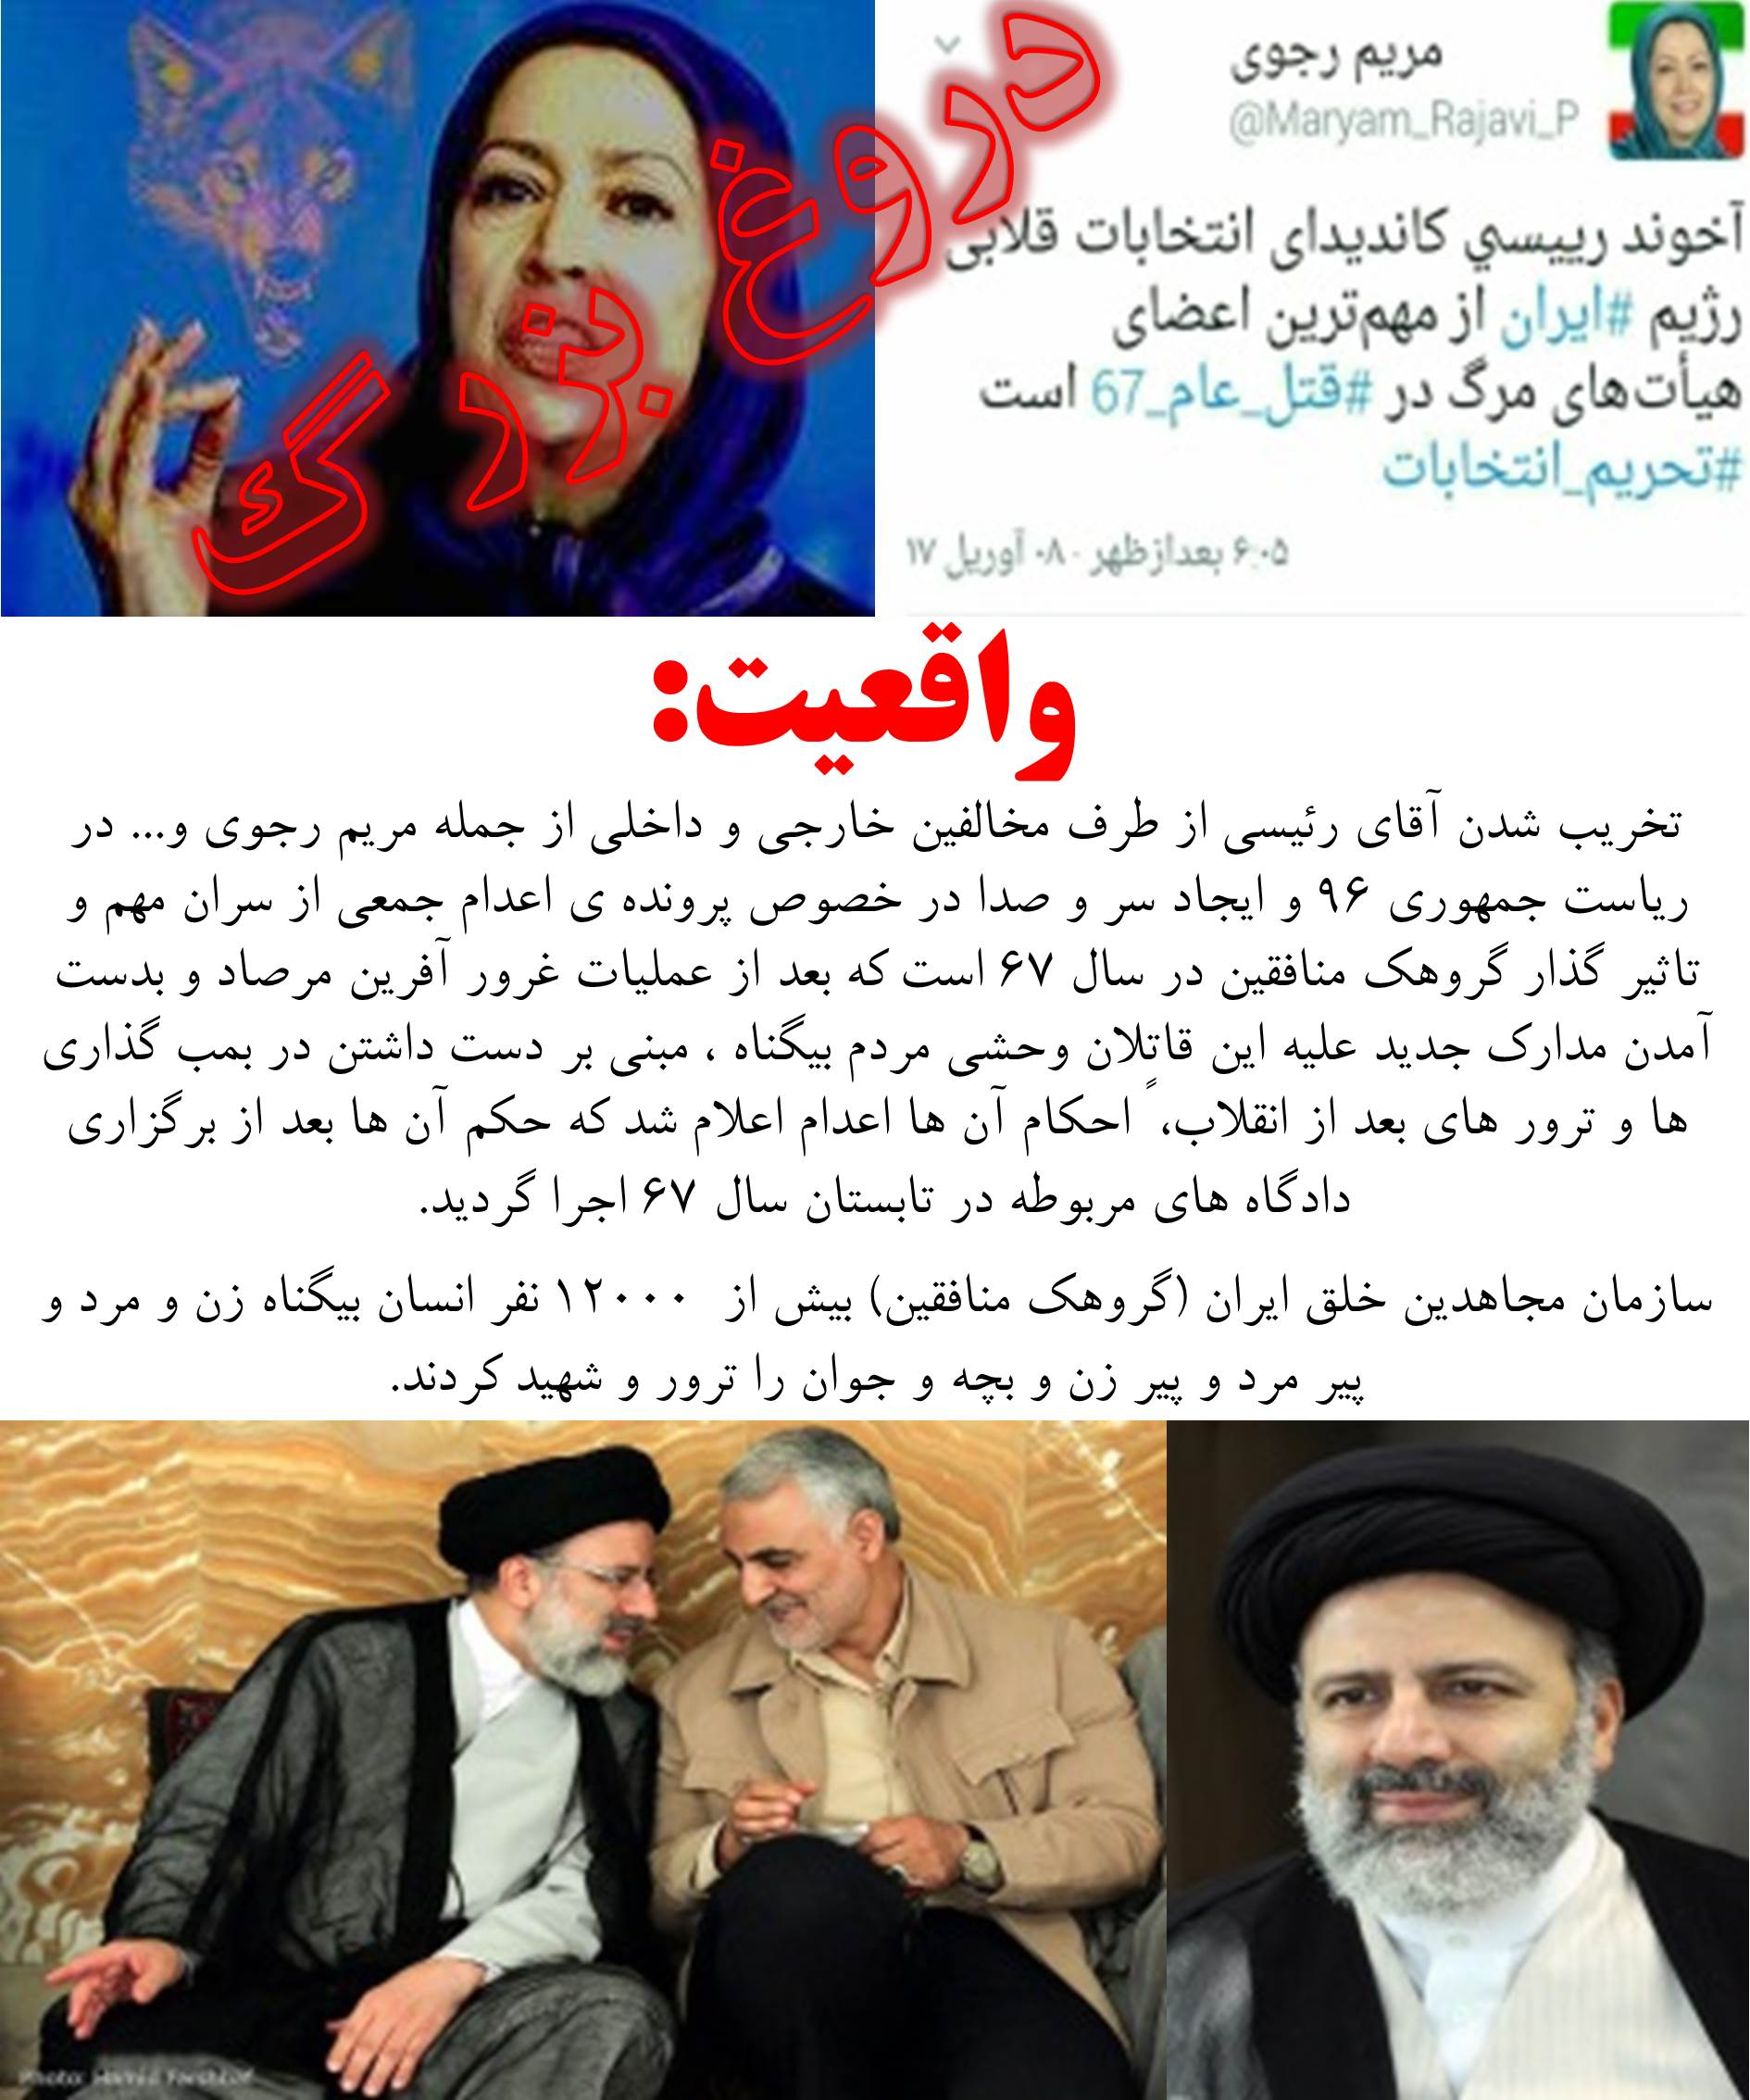 آقای حجت الاسلام رئیسی قتل عام تابستان سال 1367.jpg (1890×2268)